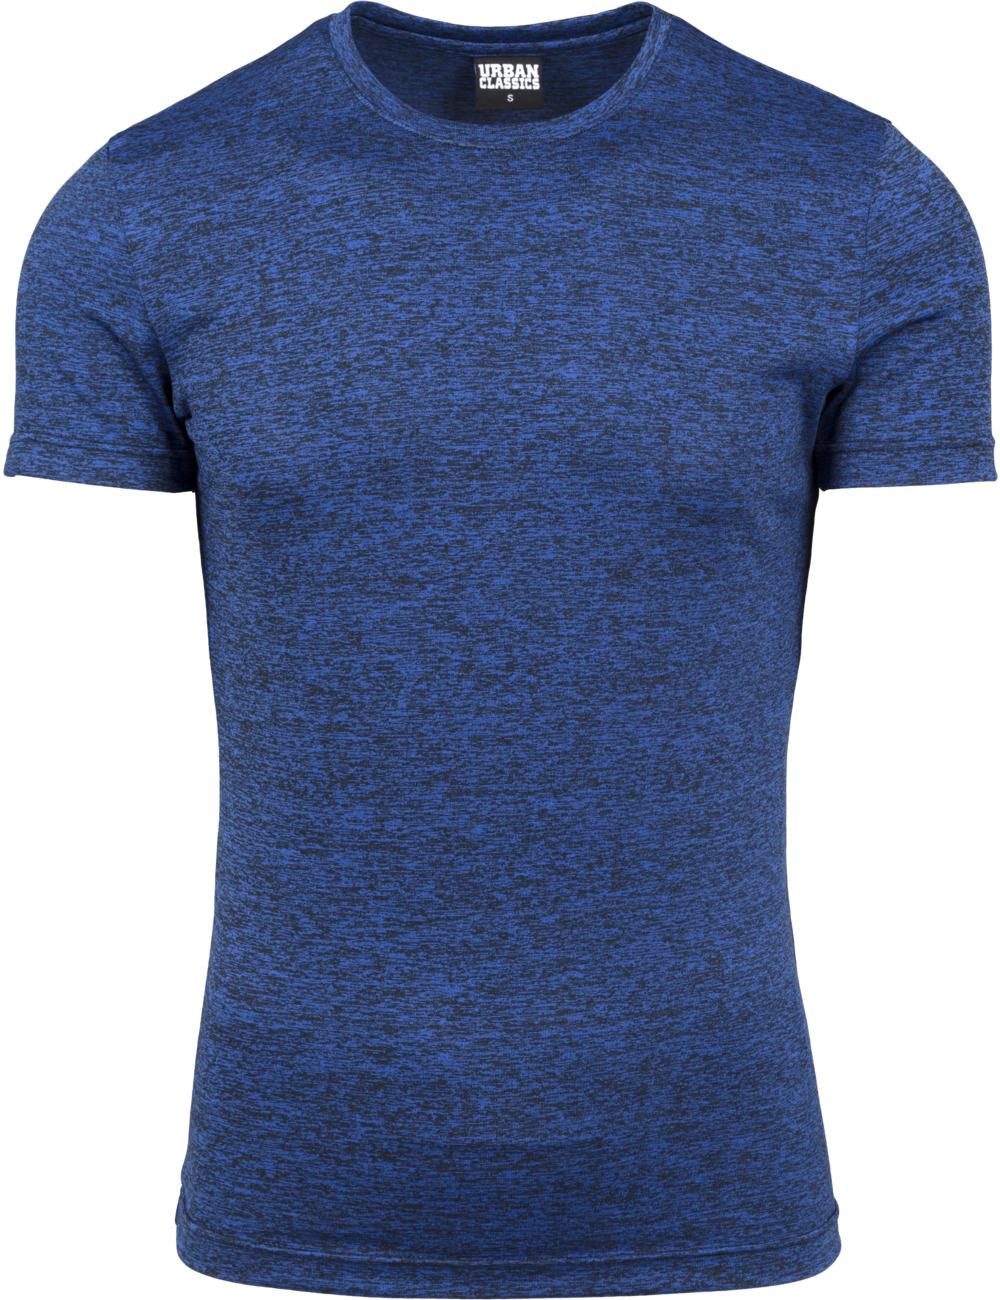 urban-classics-herren-t-shirt-active-melange, 14.90 EUR @ jeans